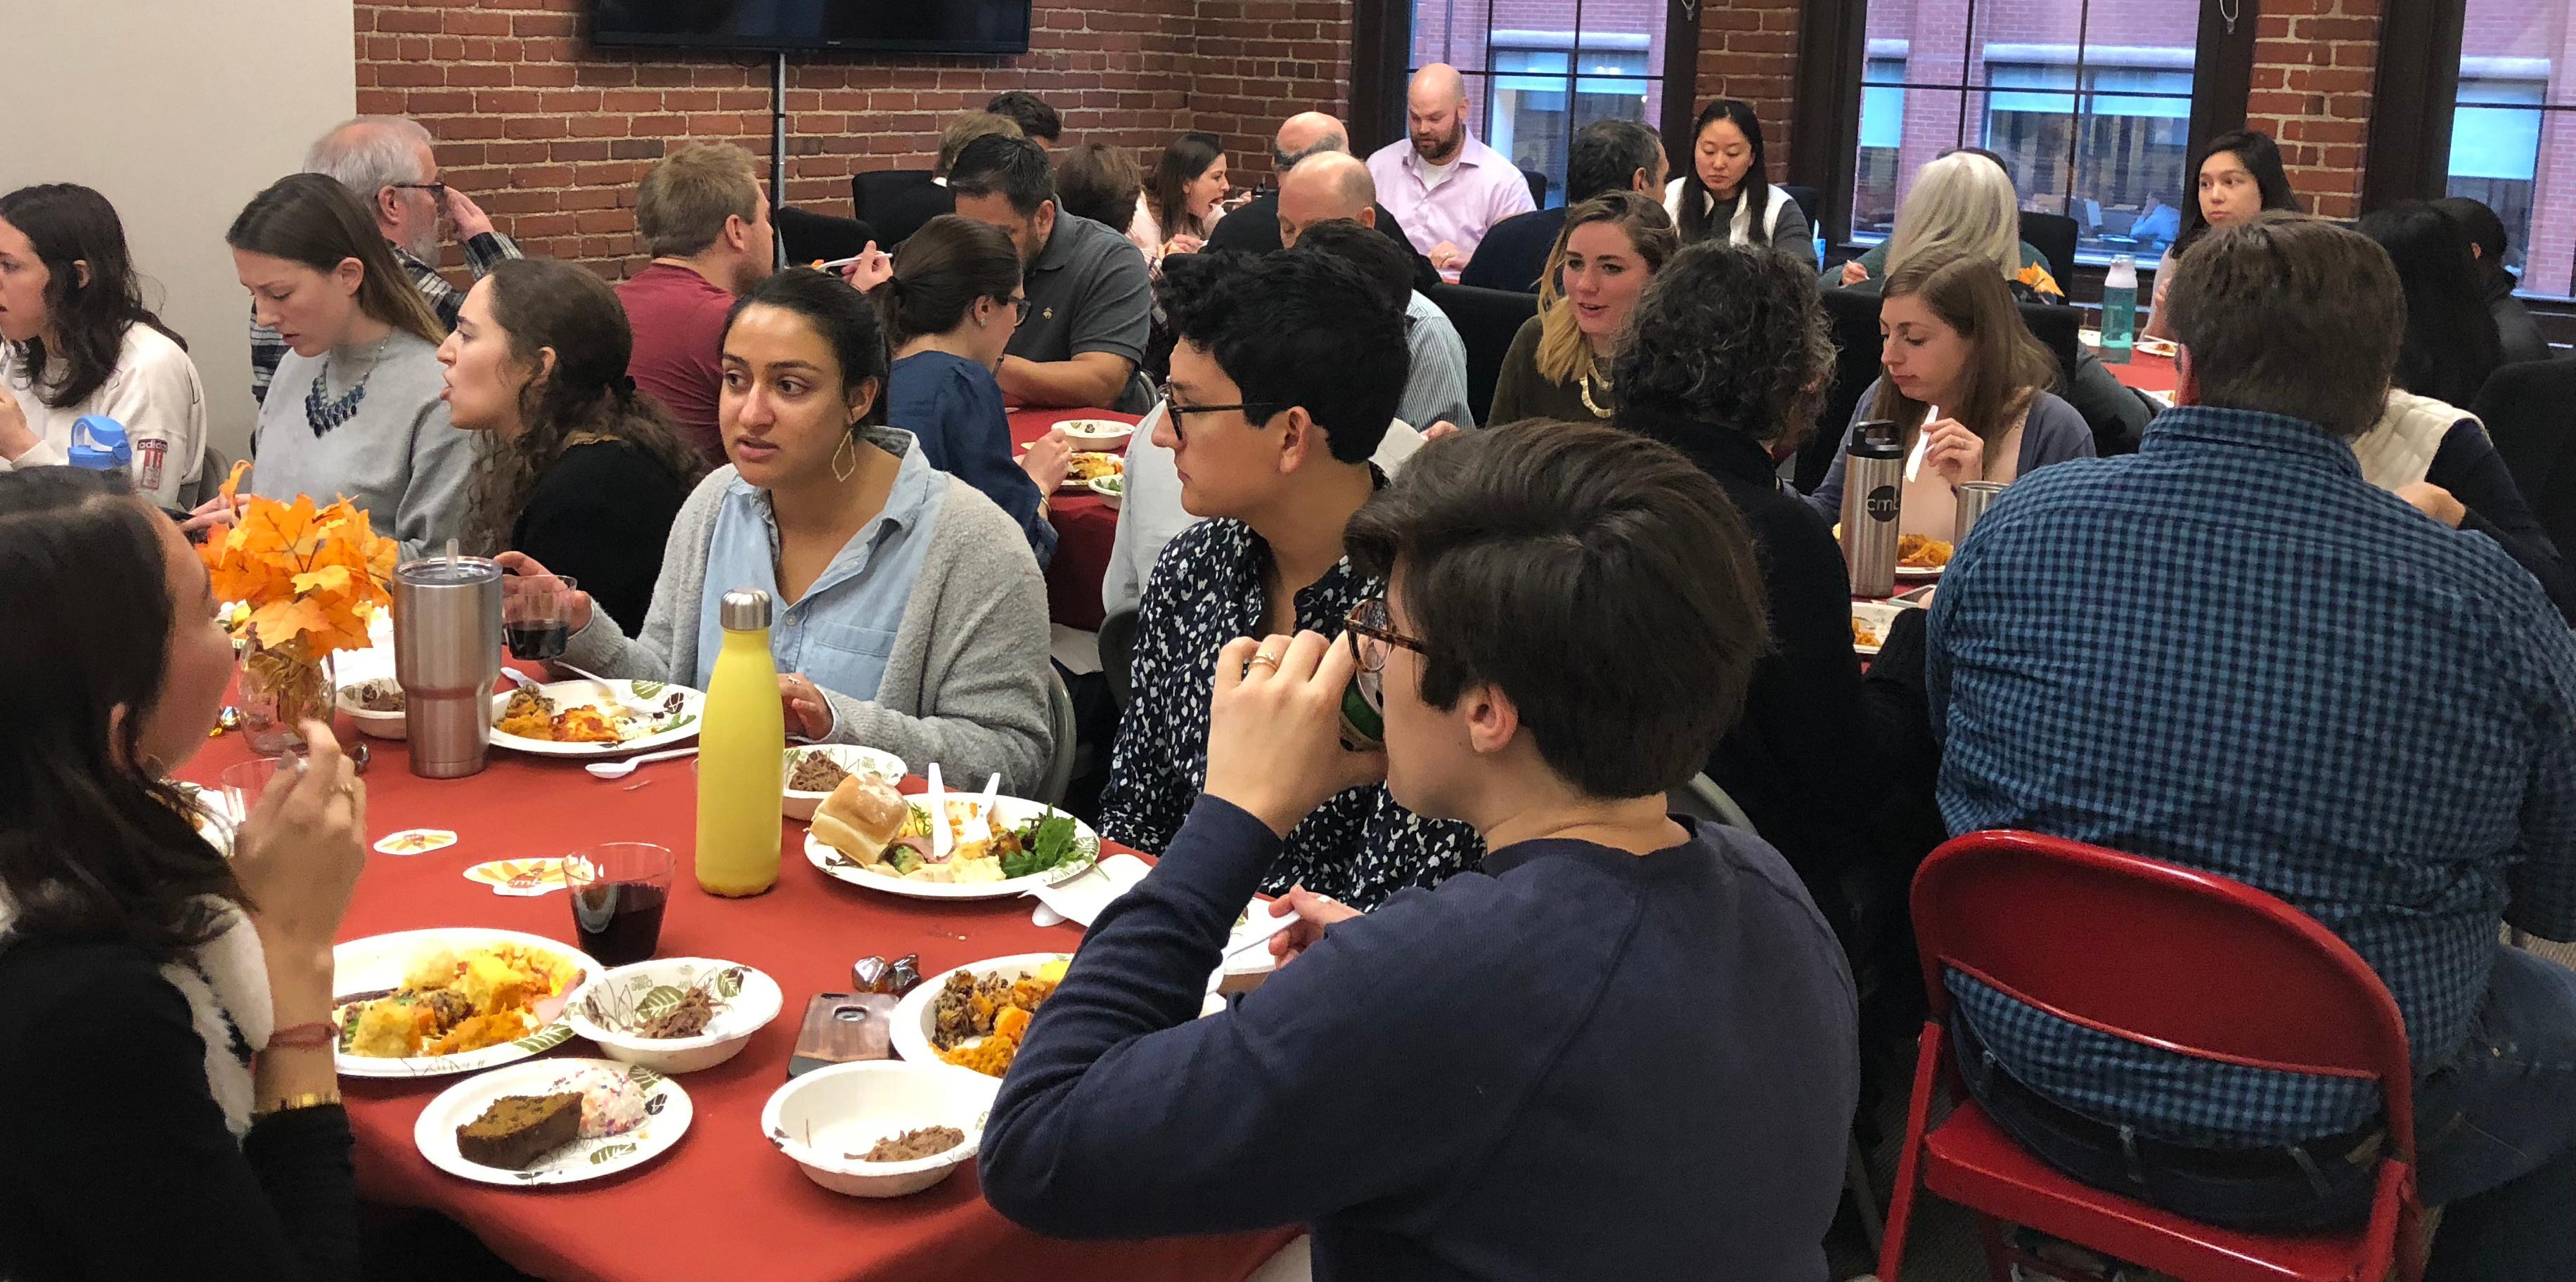 Group eating at Thanksgiving